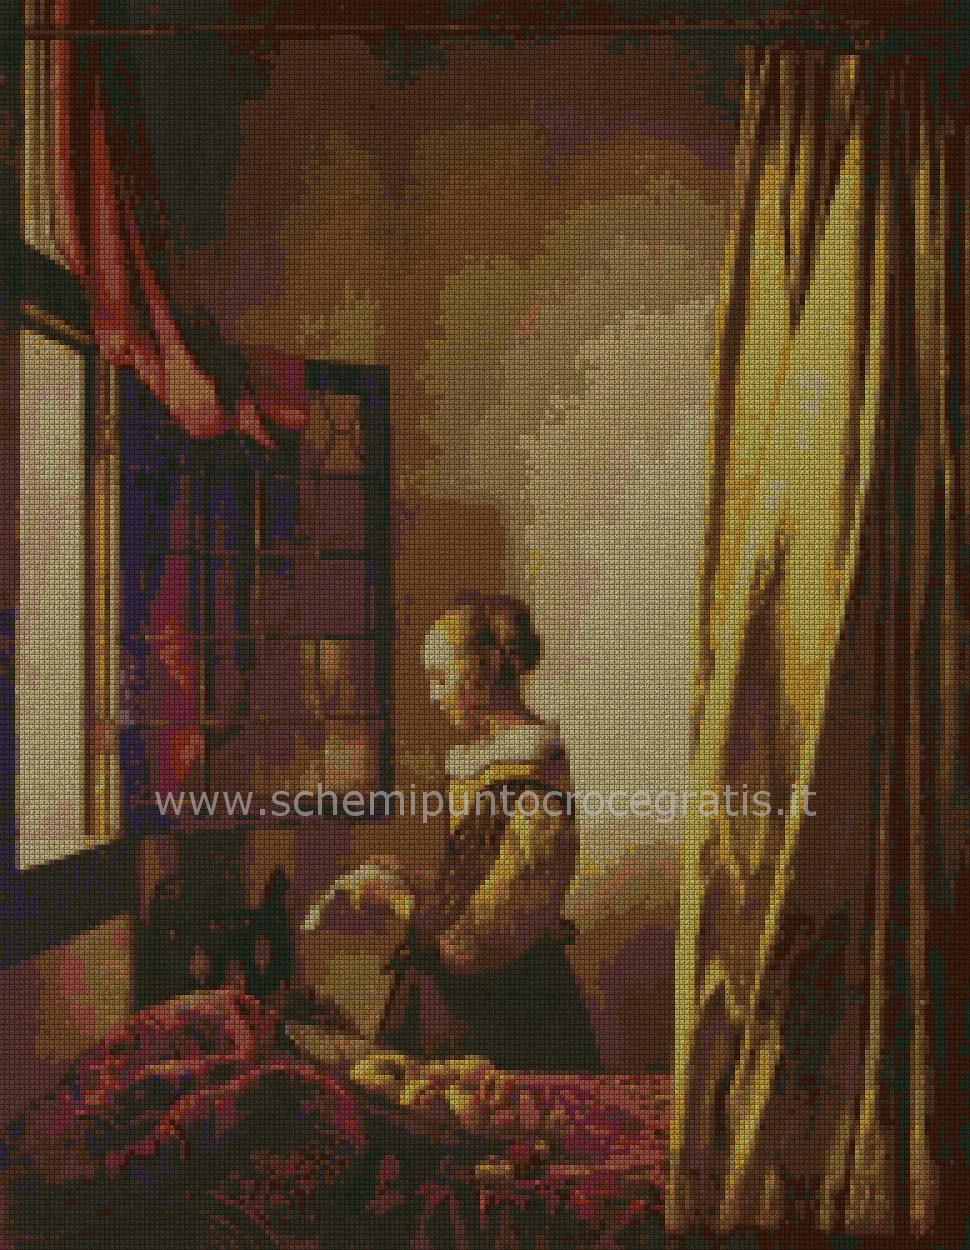 pittori_classici/vermeer/vermeer_02s.jpg